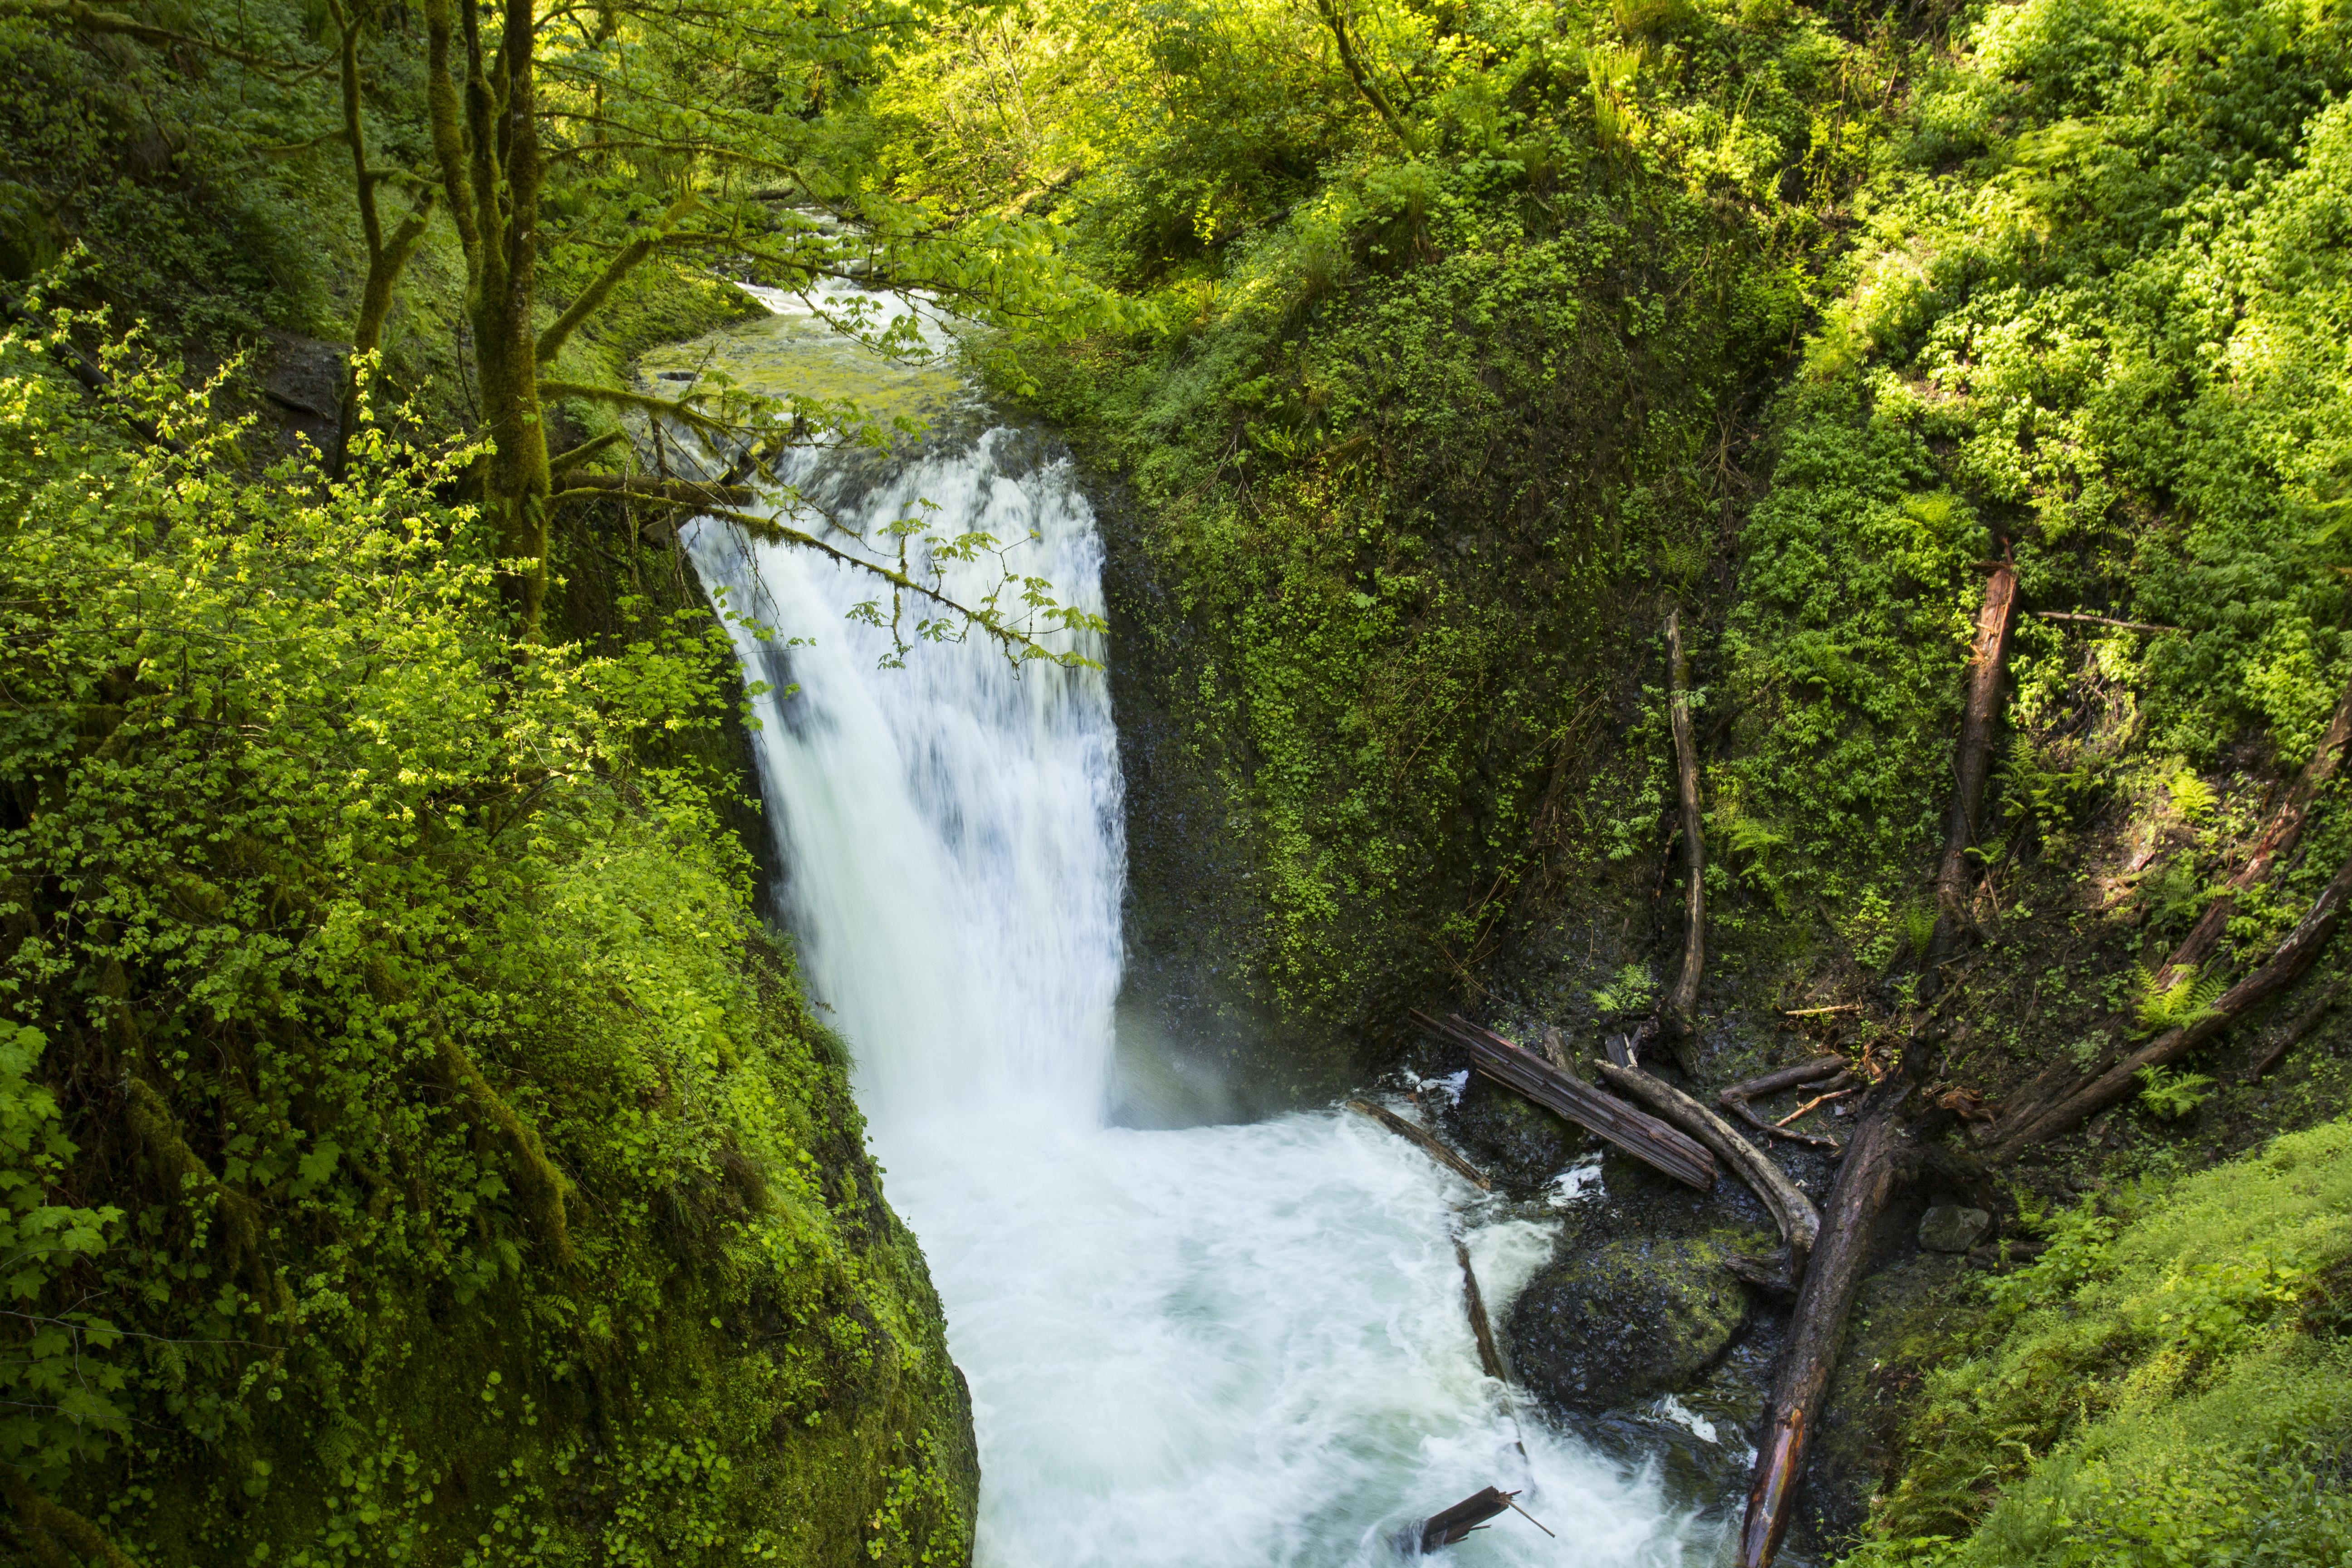 Middle Oneonta Falls, Oregon, Columbia, Falls, Gorge, Logs, HQ Photo